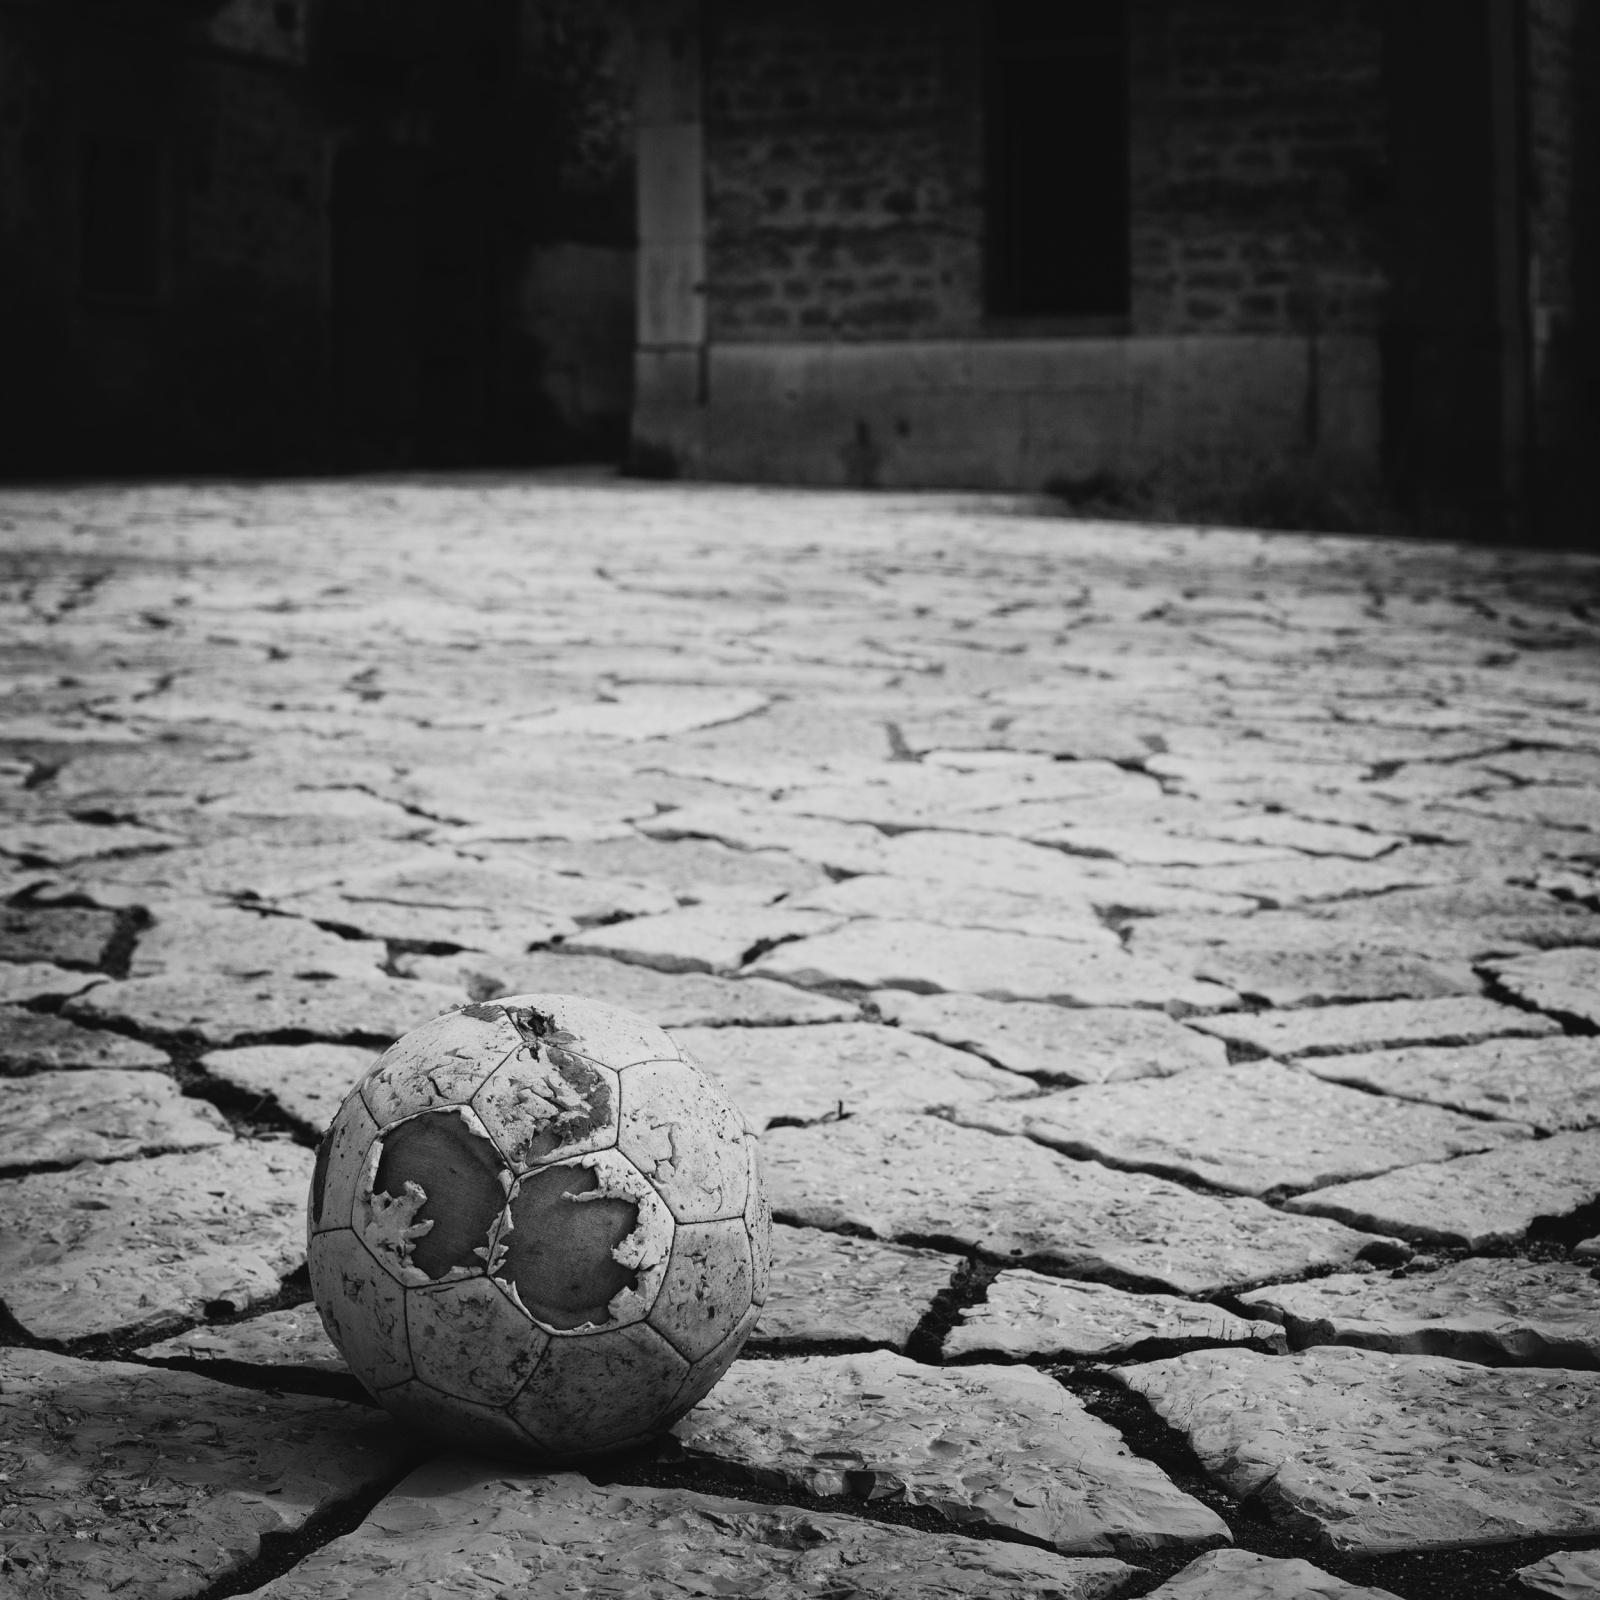 LONELINESS  Apice vecchia (No Man's Land - Luoghi)